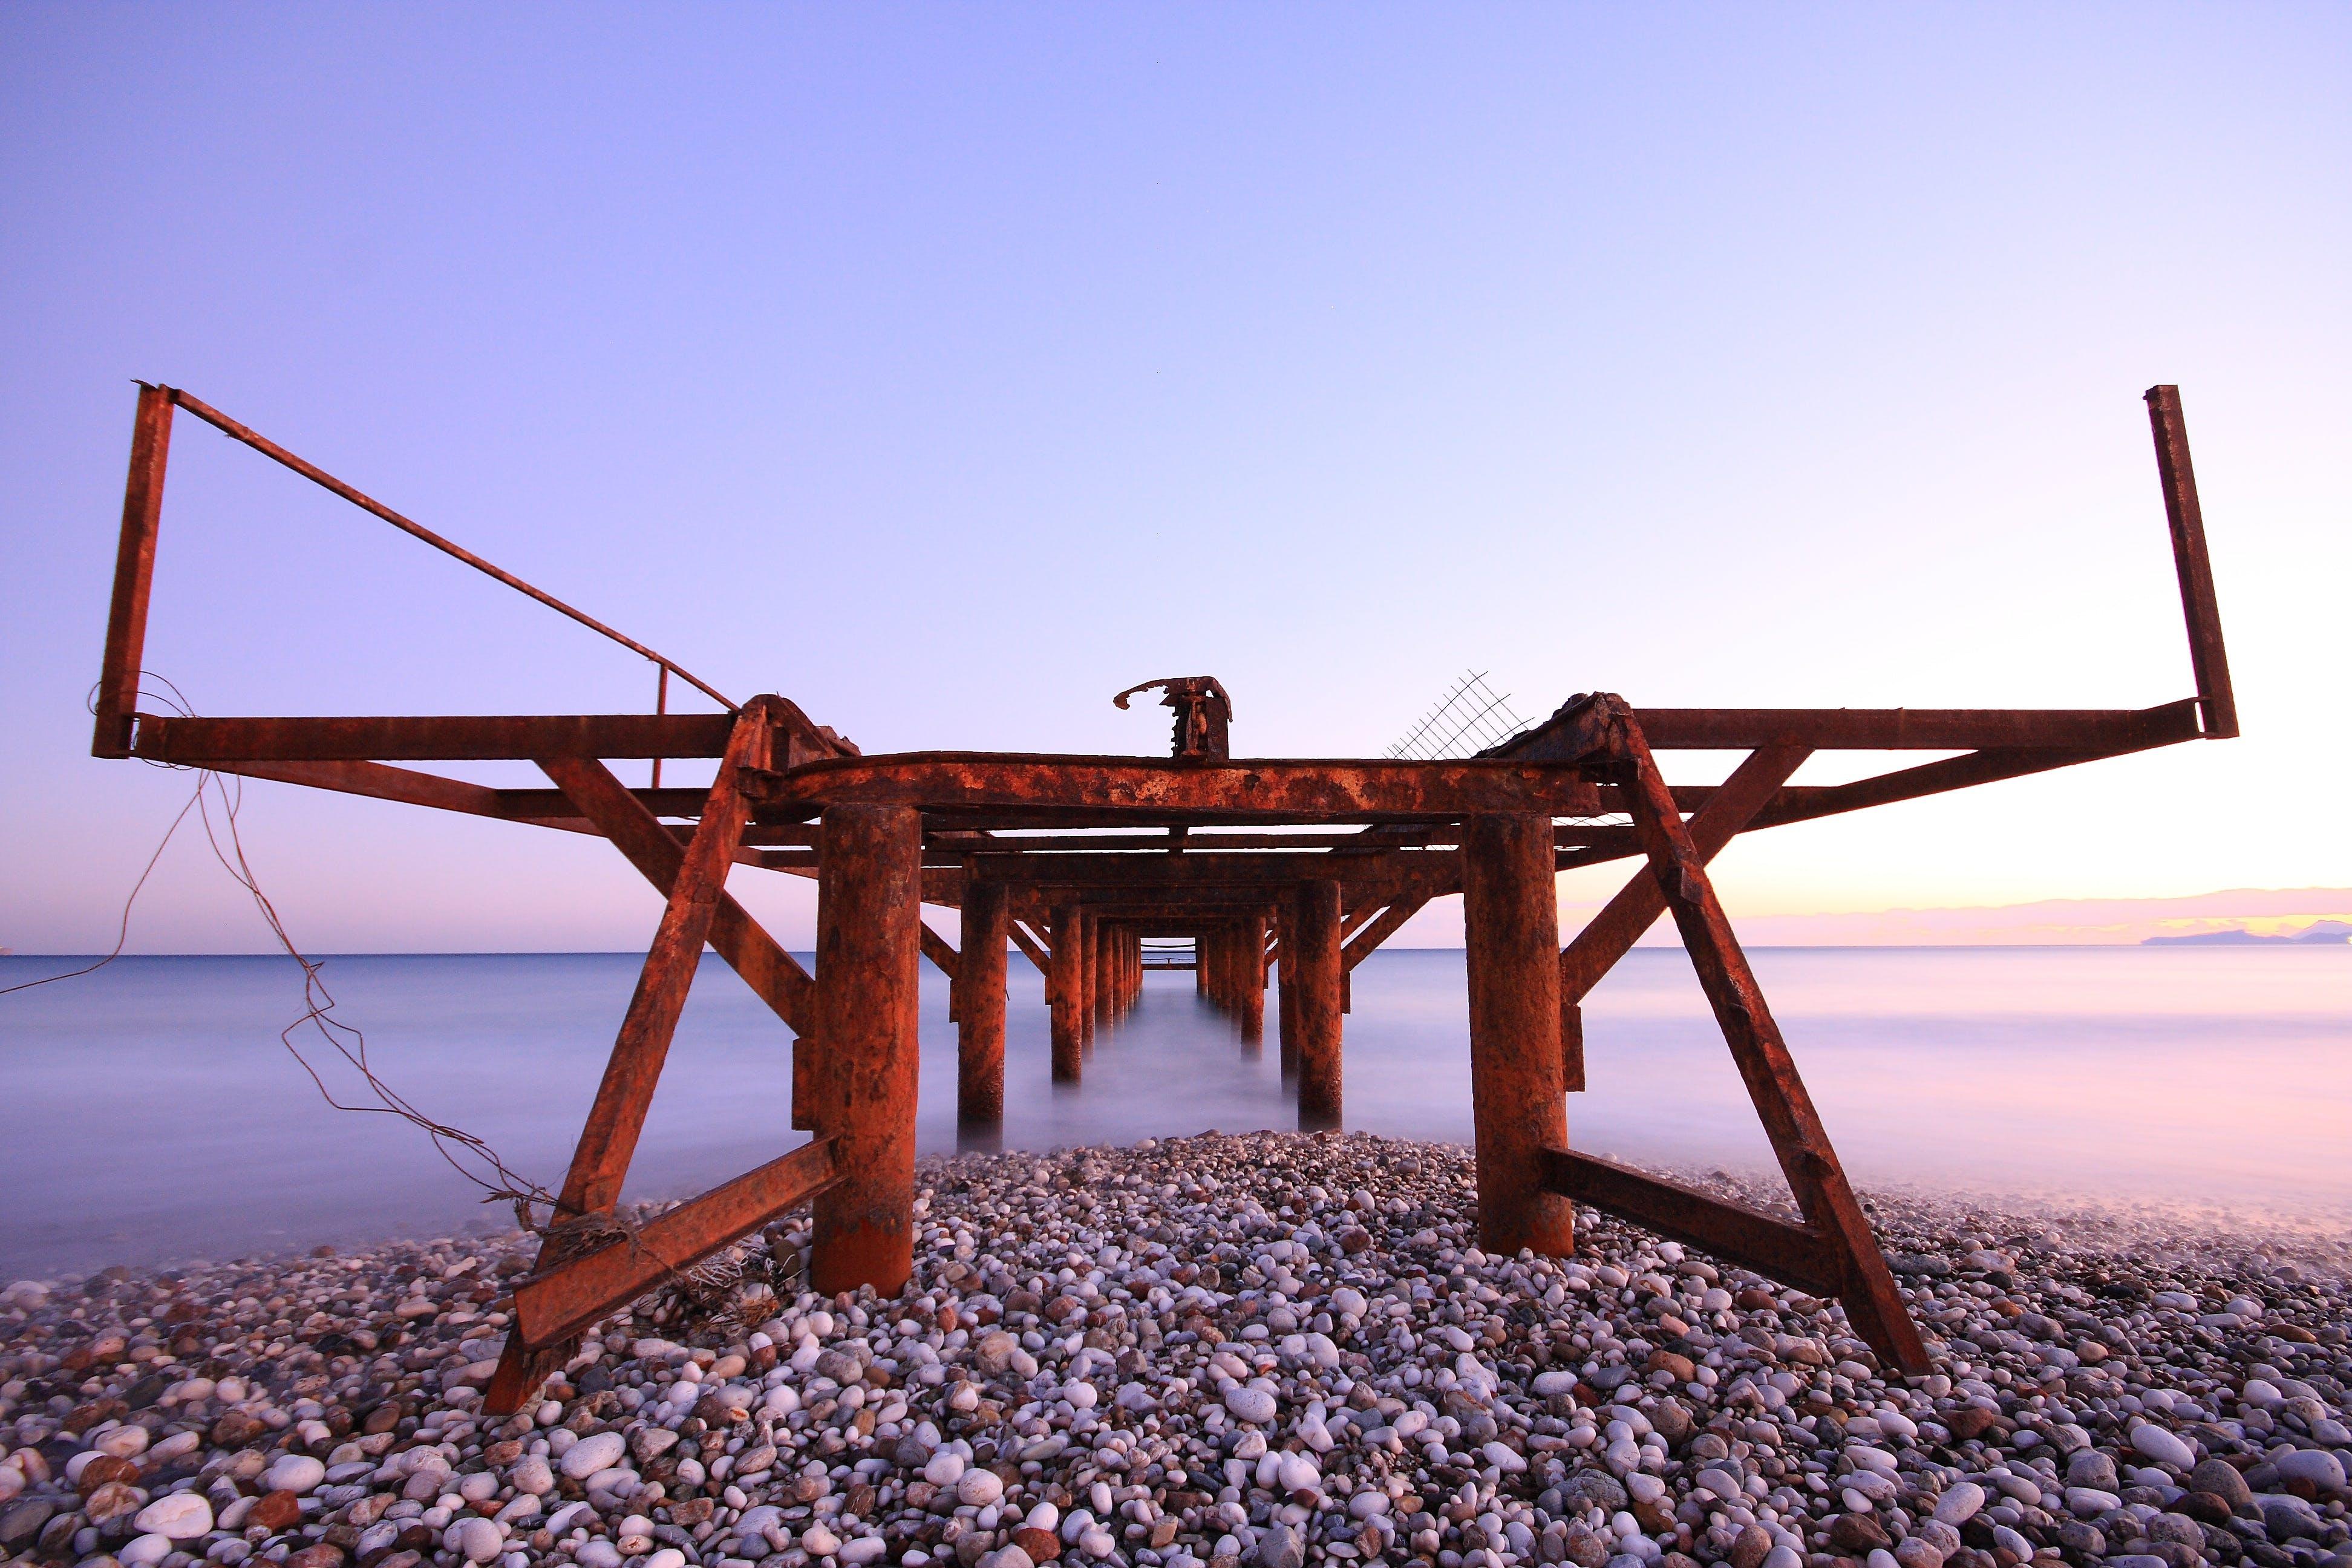 Безкоштовне стокове фото на тему «берег моря, вода, галька, горизонт»